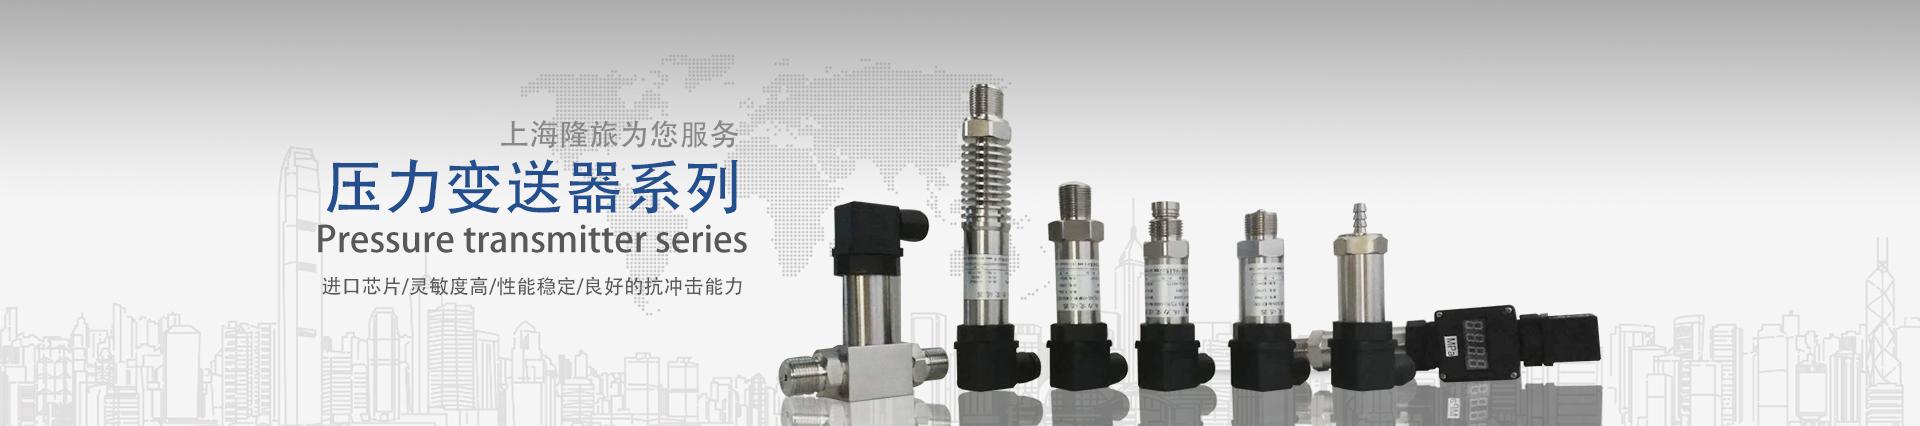 PTL600系列微压液位传感器